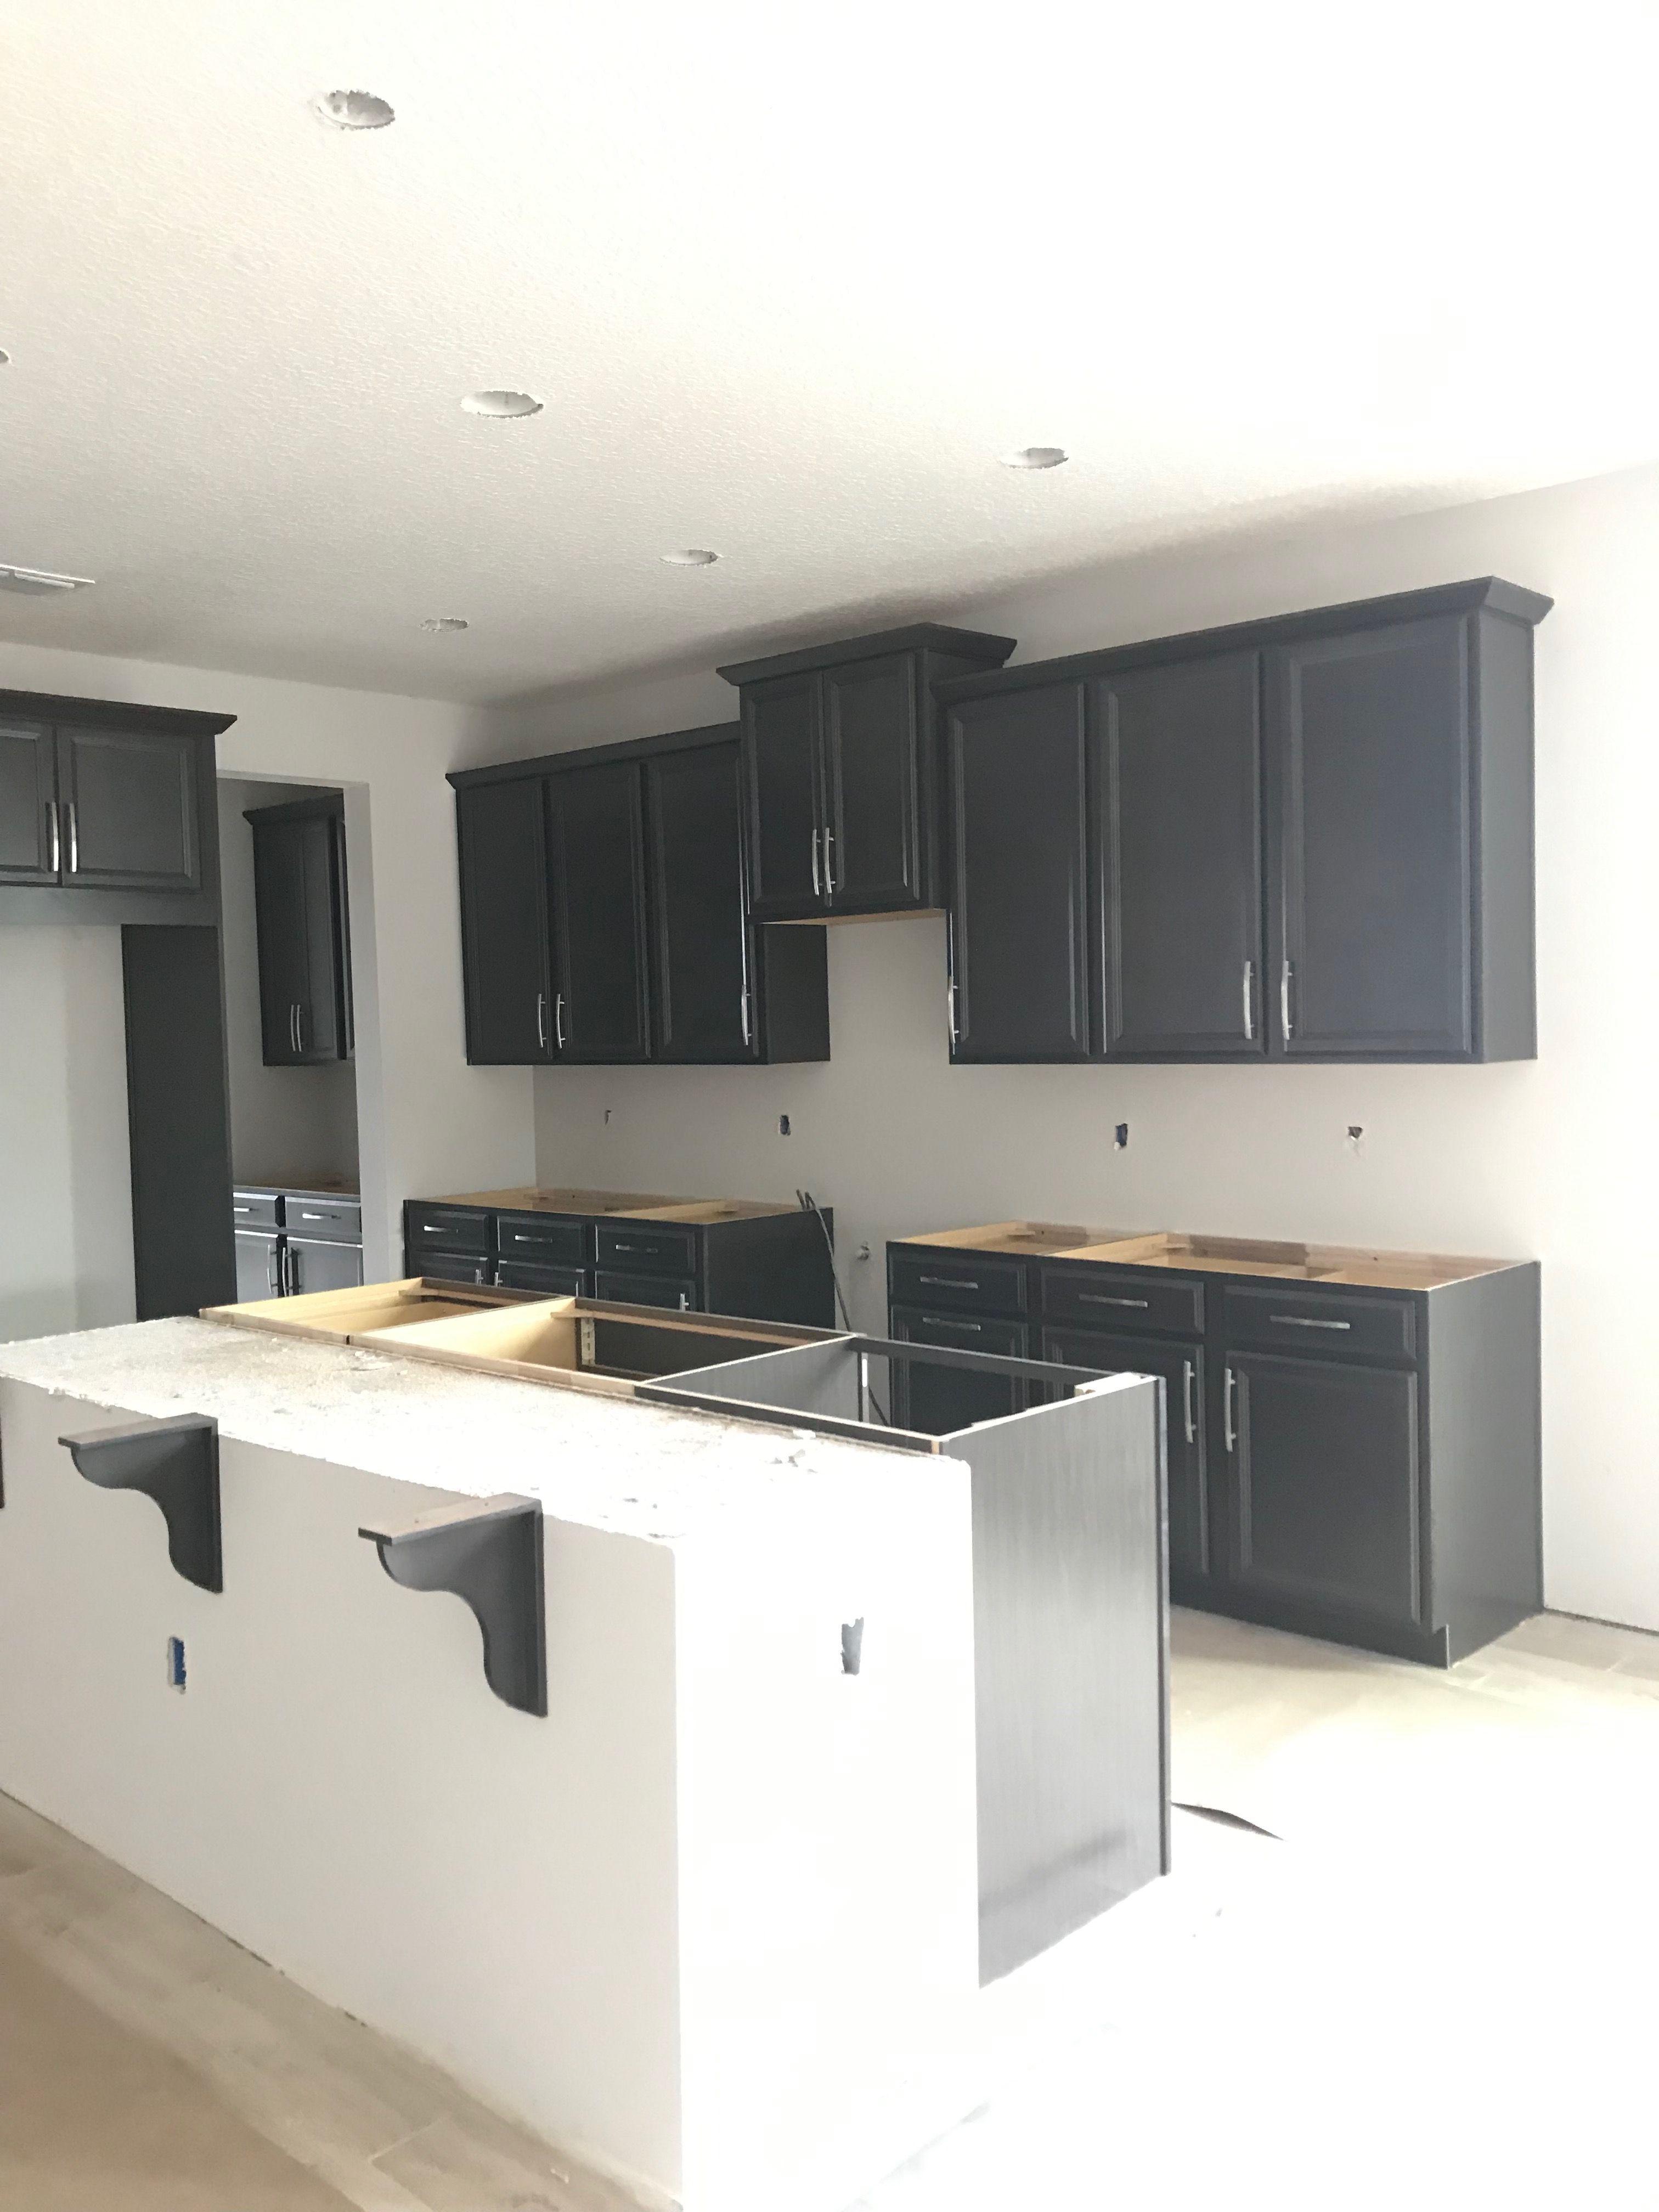 cherry slate grey kitchen cabinets grey kitchen cabinets kitchen grey kitchen on kitchen decor grey cabinets id=92362